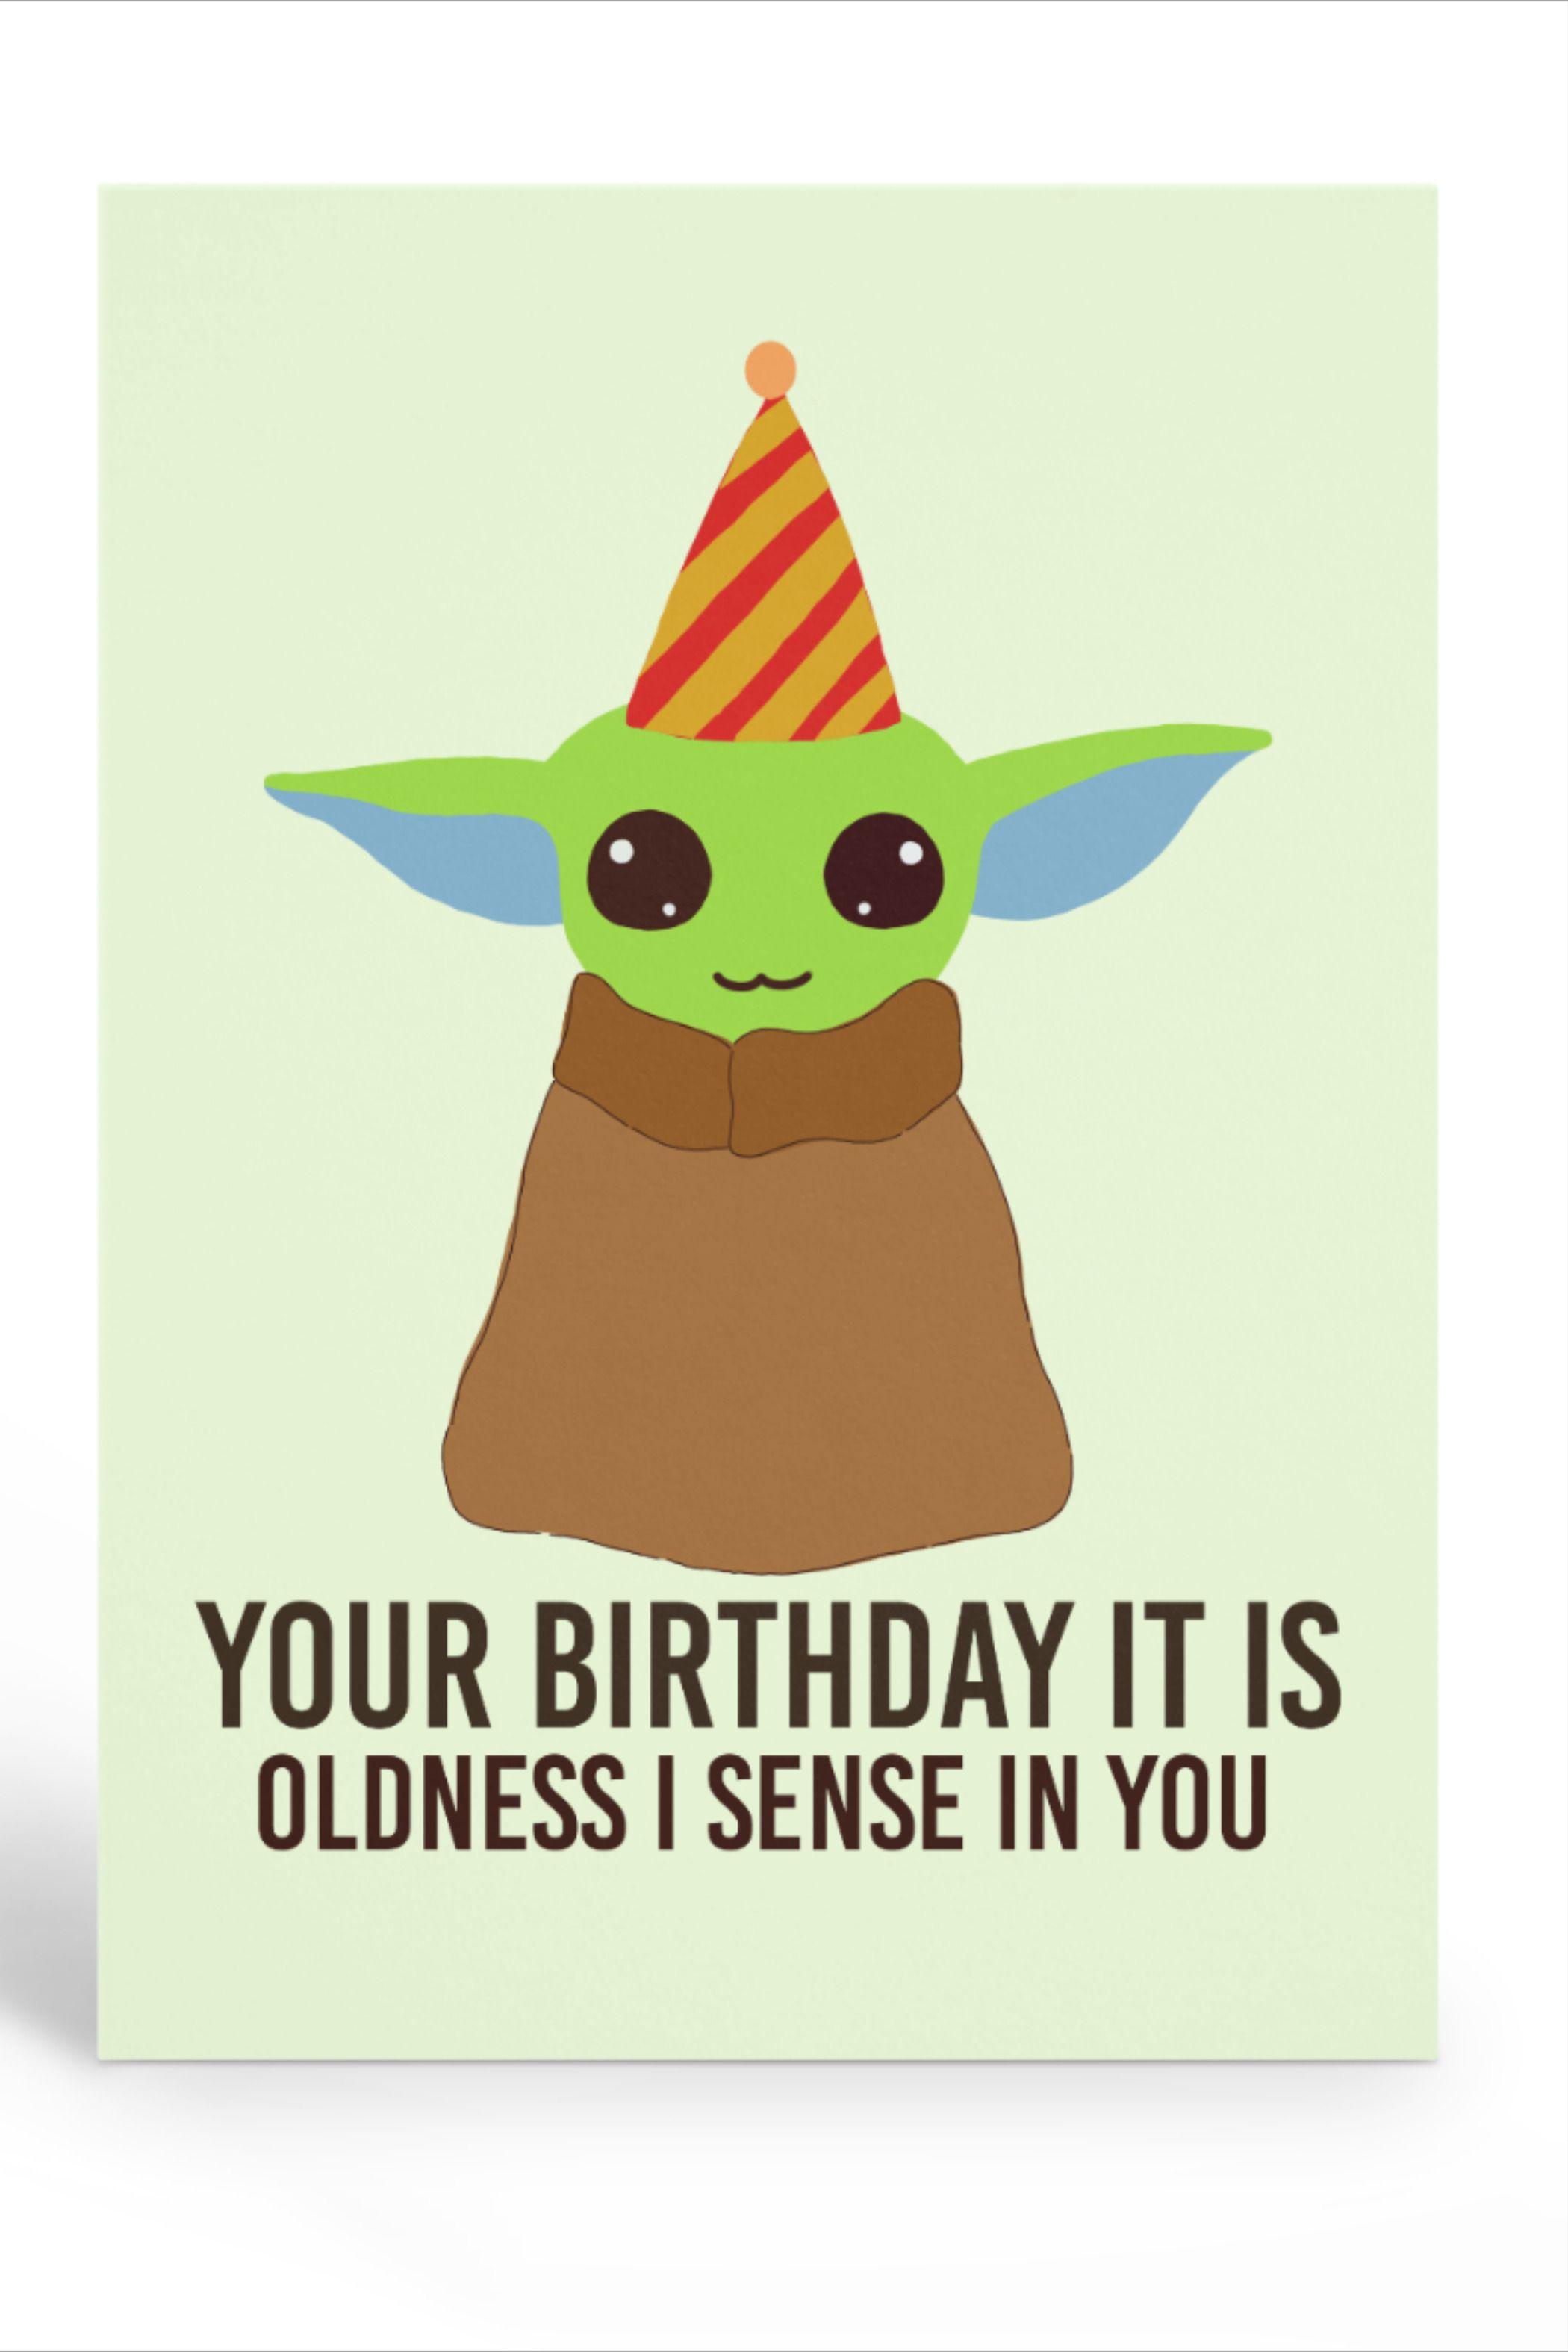 Baby Yoda The Mandalorian Birthday Card Yoda Happy Birthday Cool Birthday Cards Yoda Card